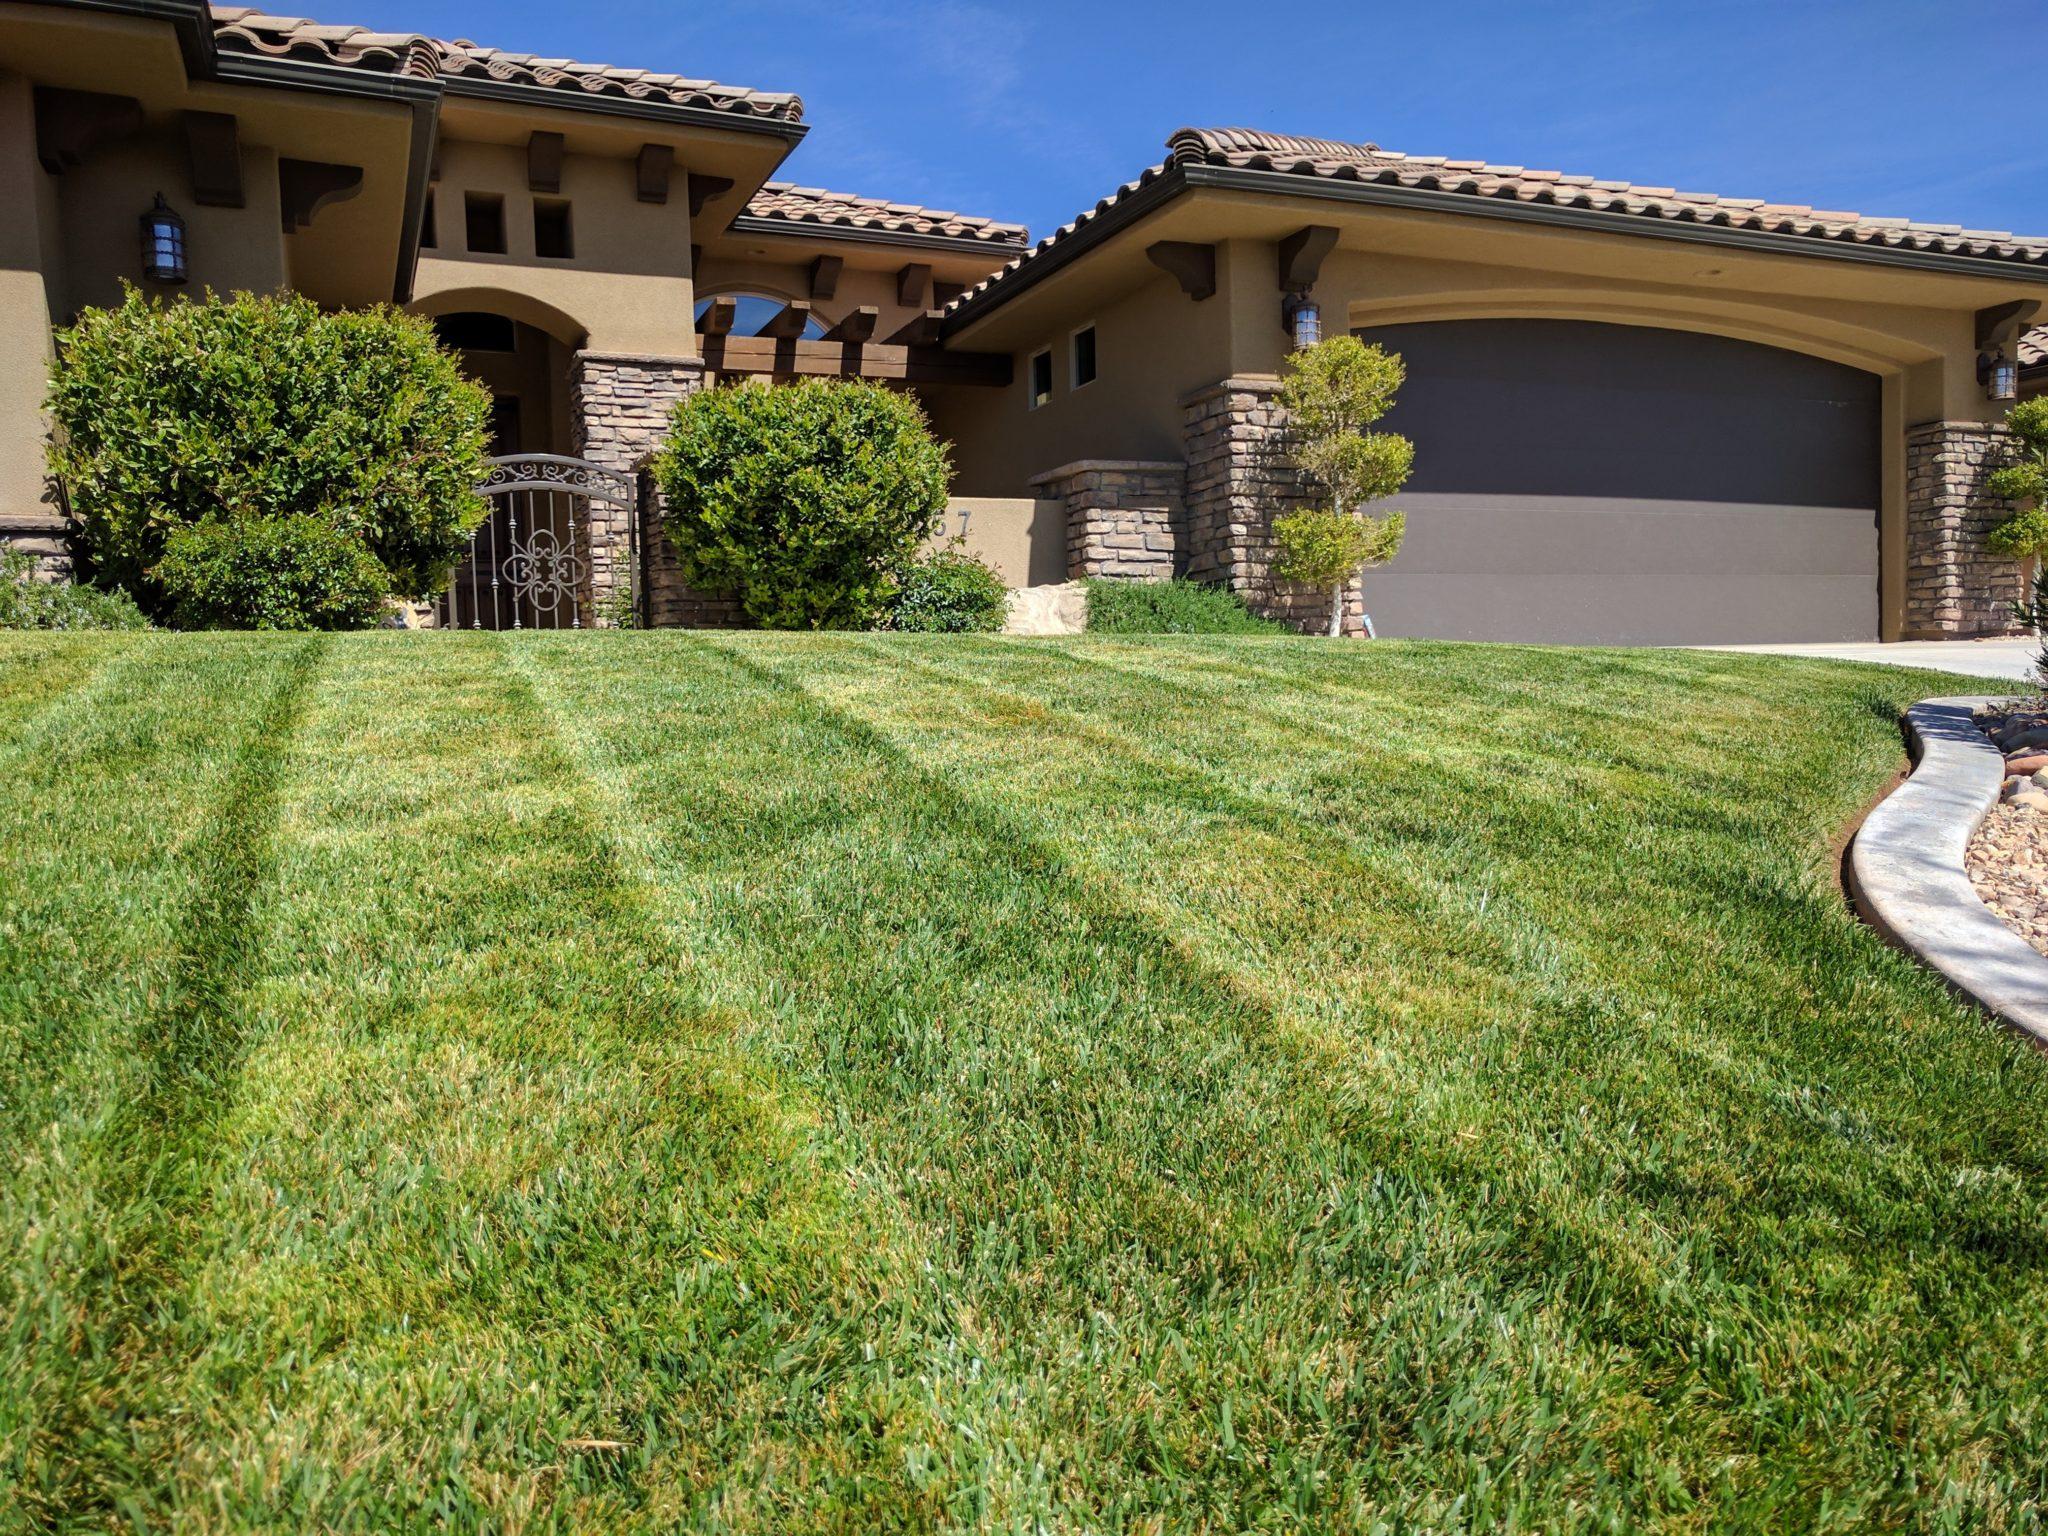 lawn care washington utah